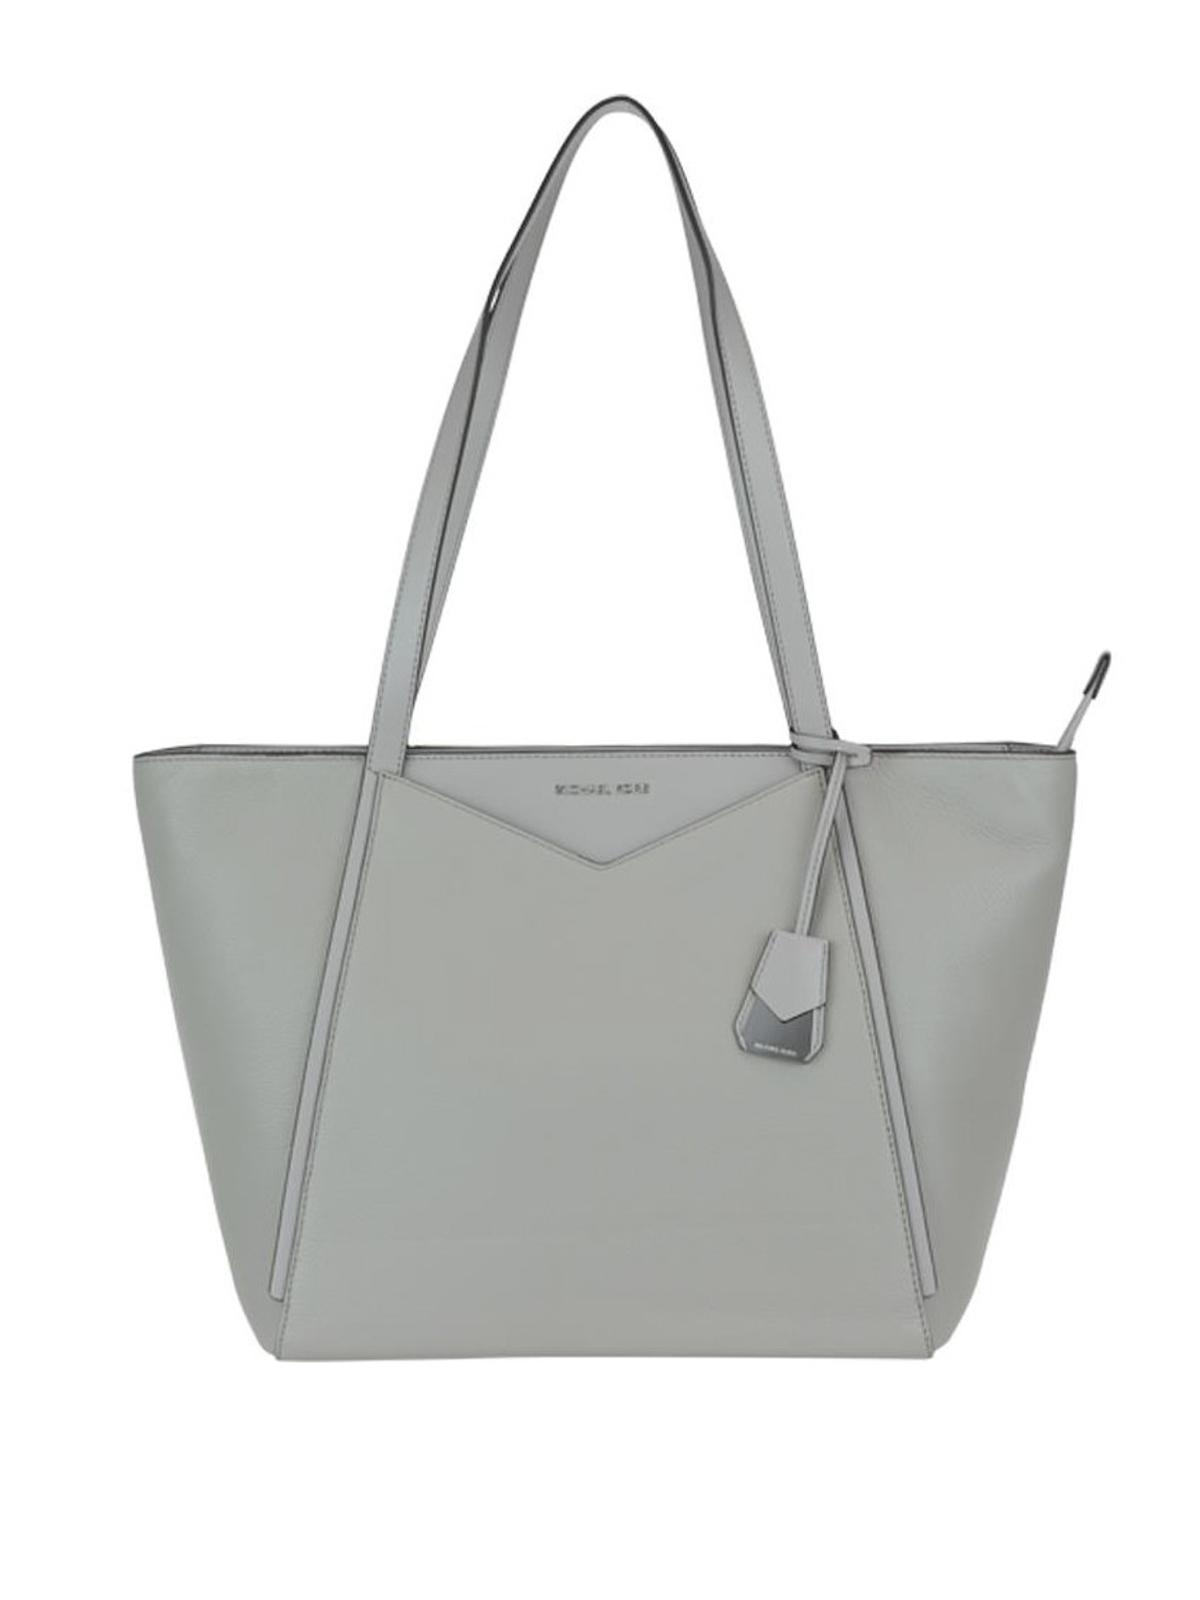 814136e4e6f1 Michael Kors - Whitney pearl grey large tote - totes bags ...